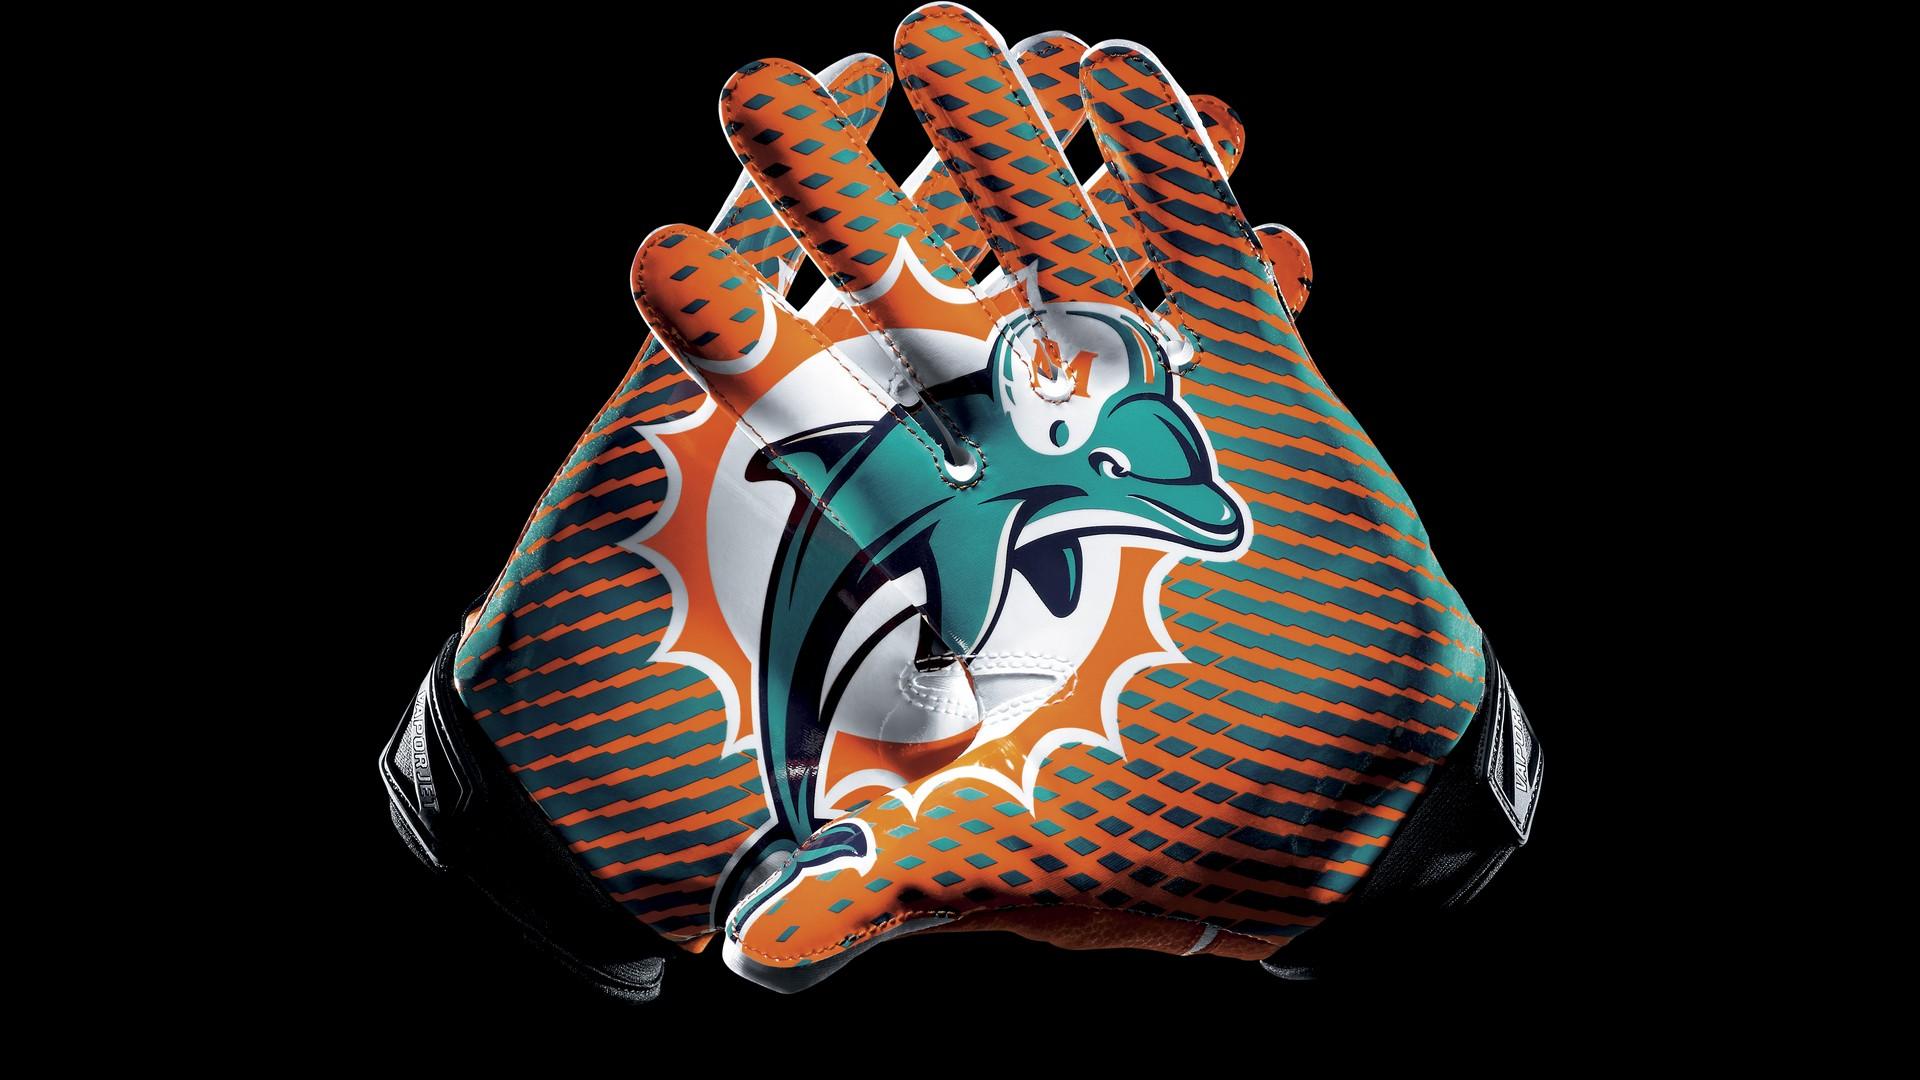 Miami Dolphins desktop background hd